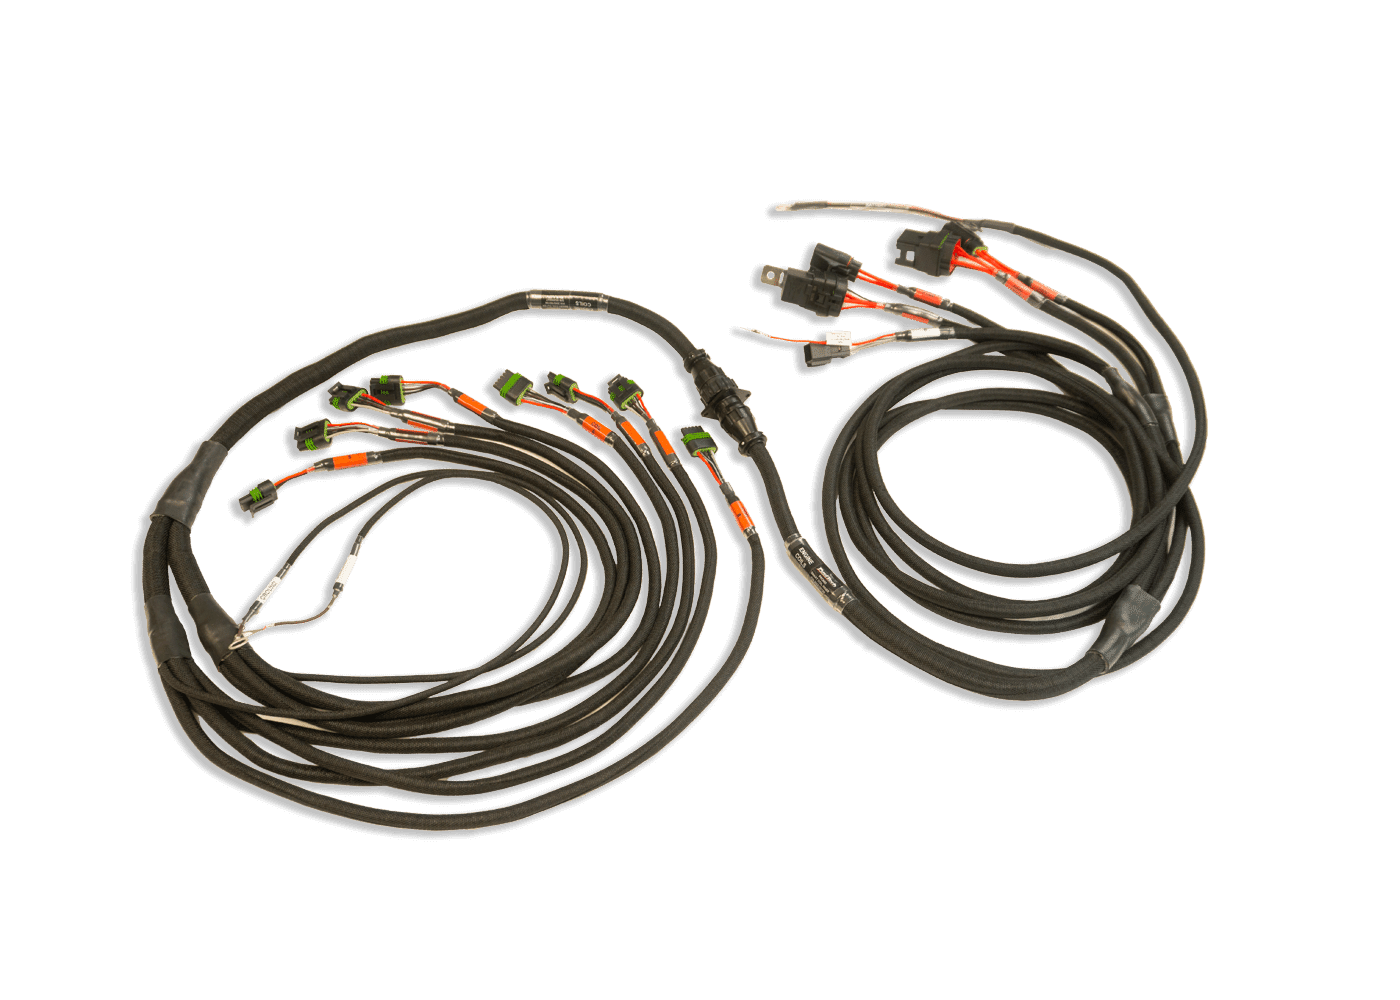 PRO550/600 V8 SMART COIL HARNESS - Aeromotive, Inc   Aeromotive Wire Harness      Aeromotive, Inc